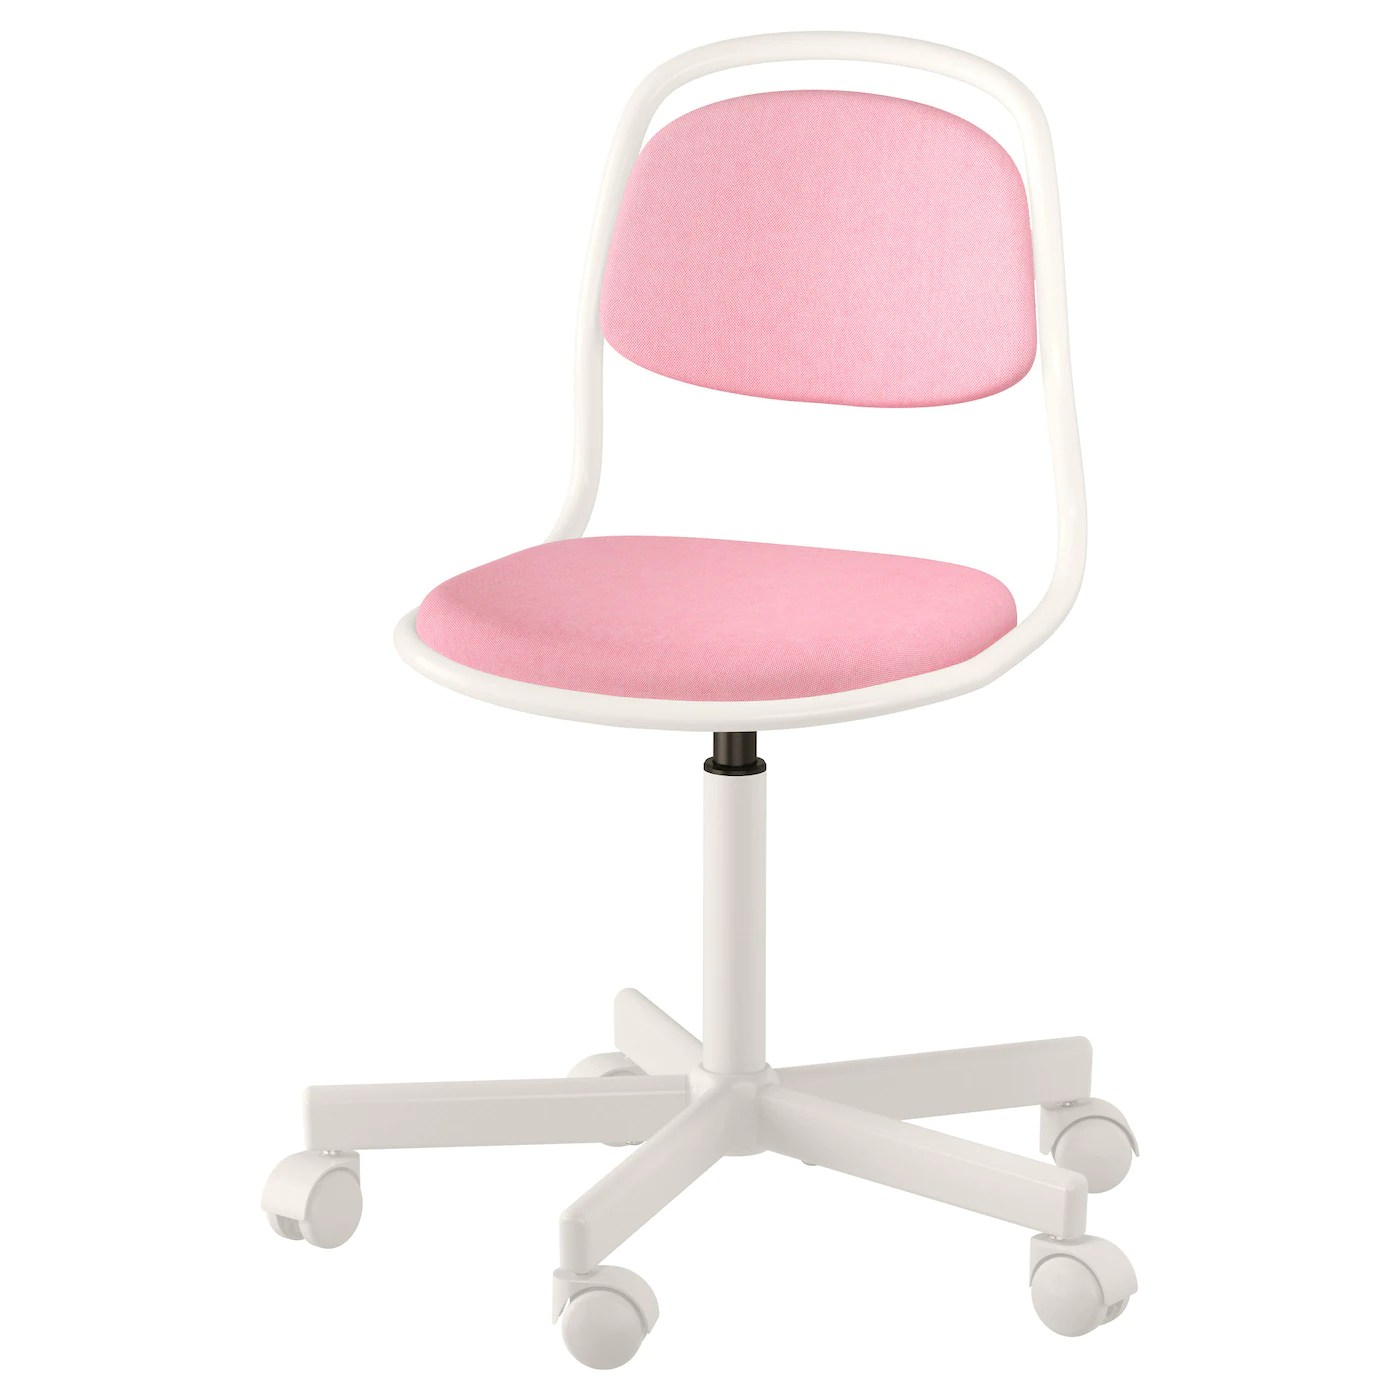 ikea junior desk chair armless sectional ÖrfjÄll children 39s white vissle pink